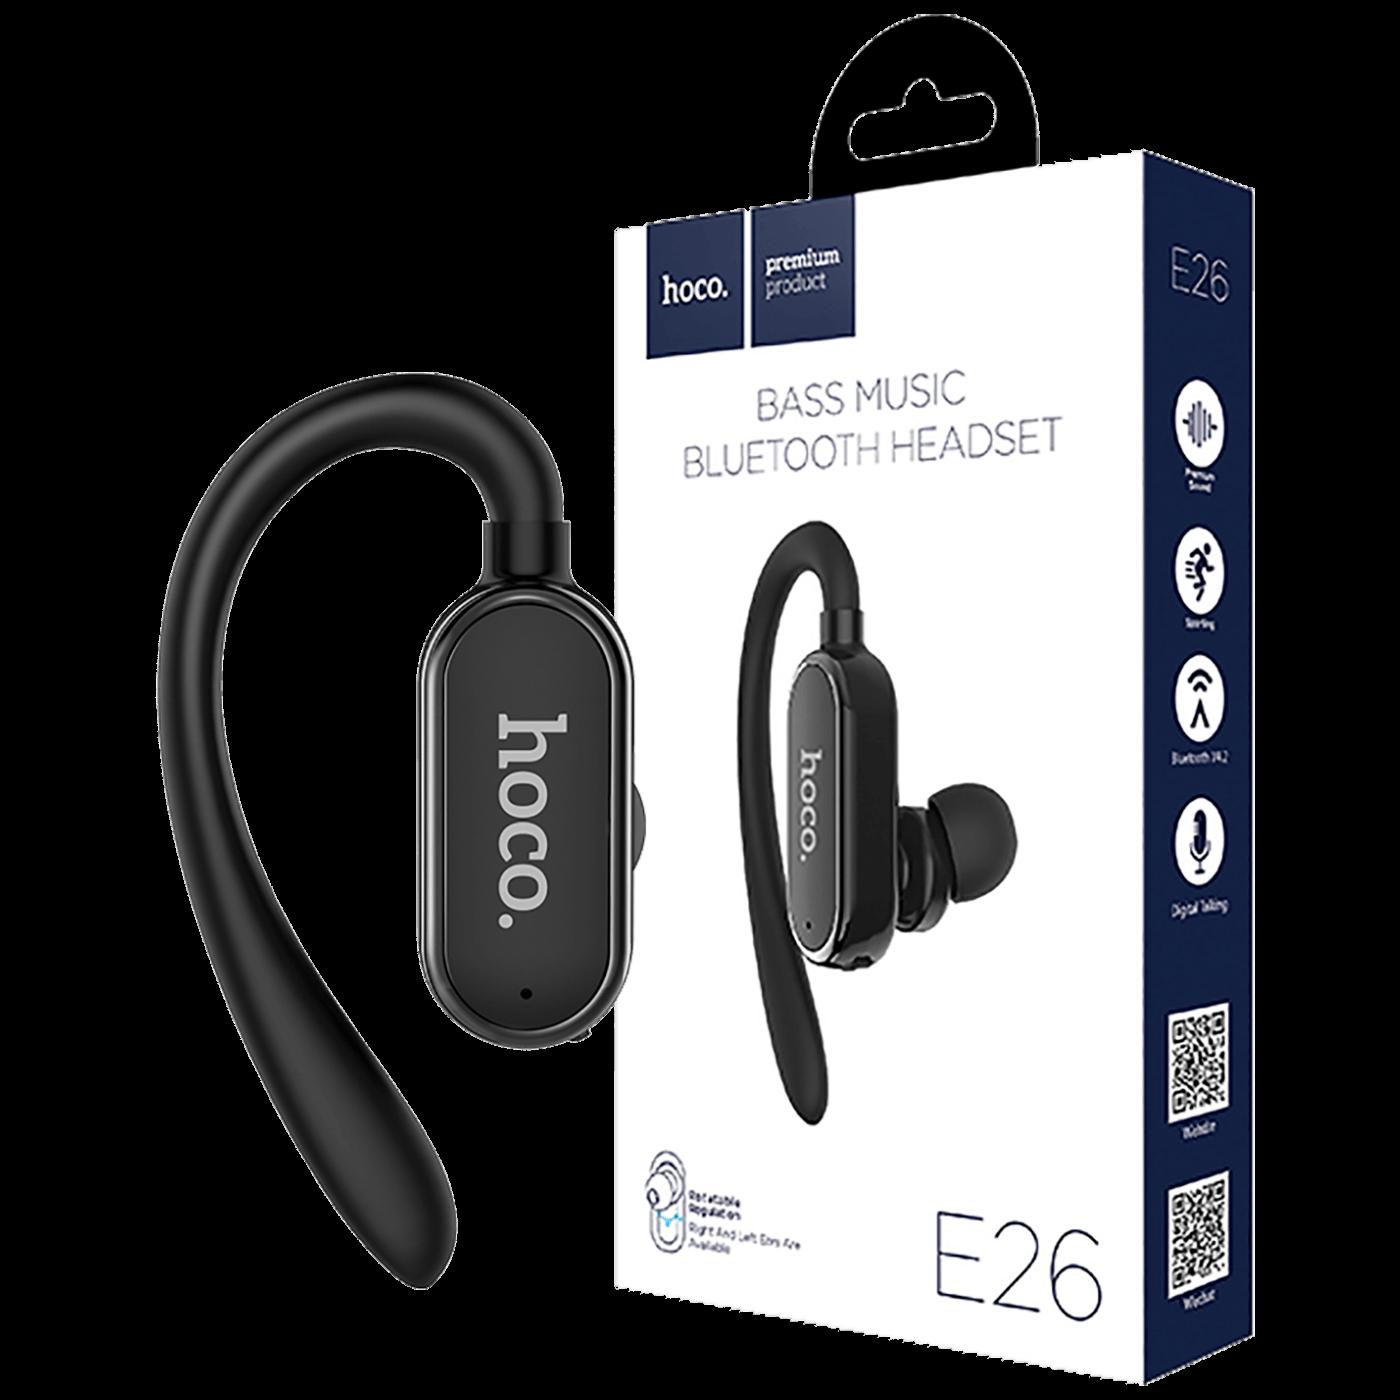 hoco. - E26 Peaceful BT headset